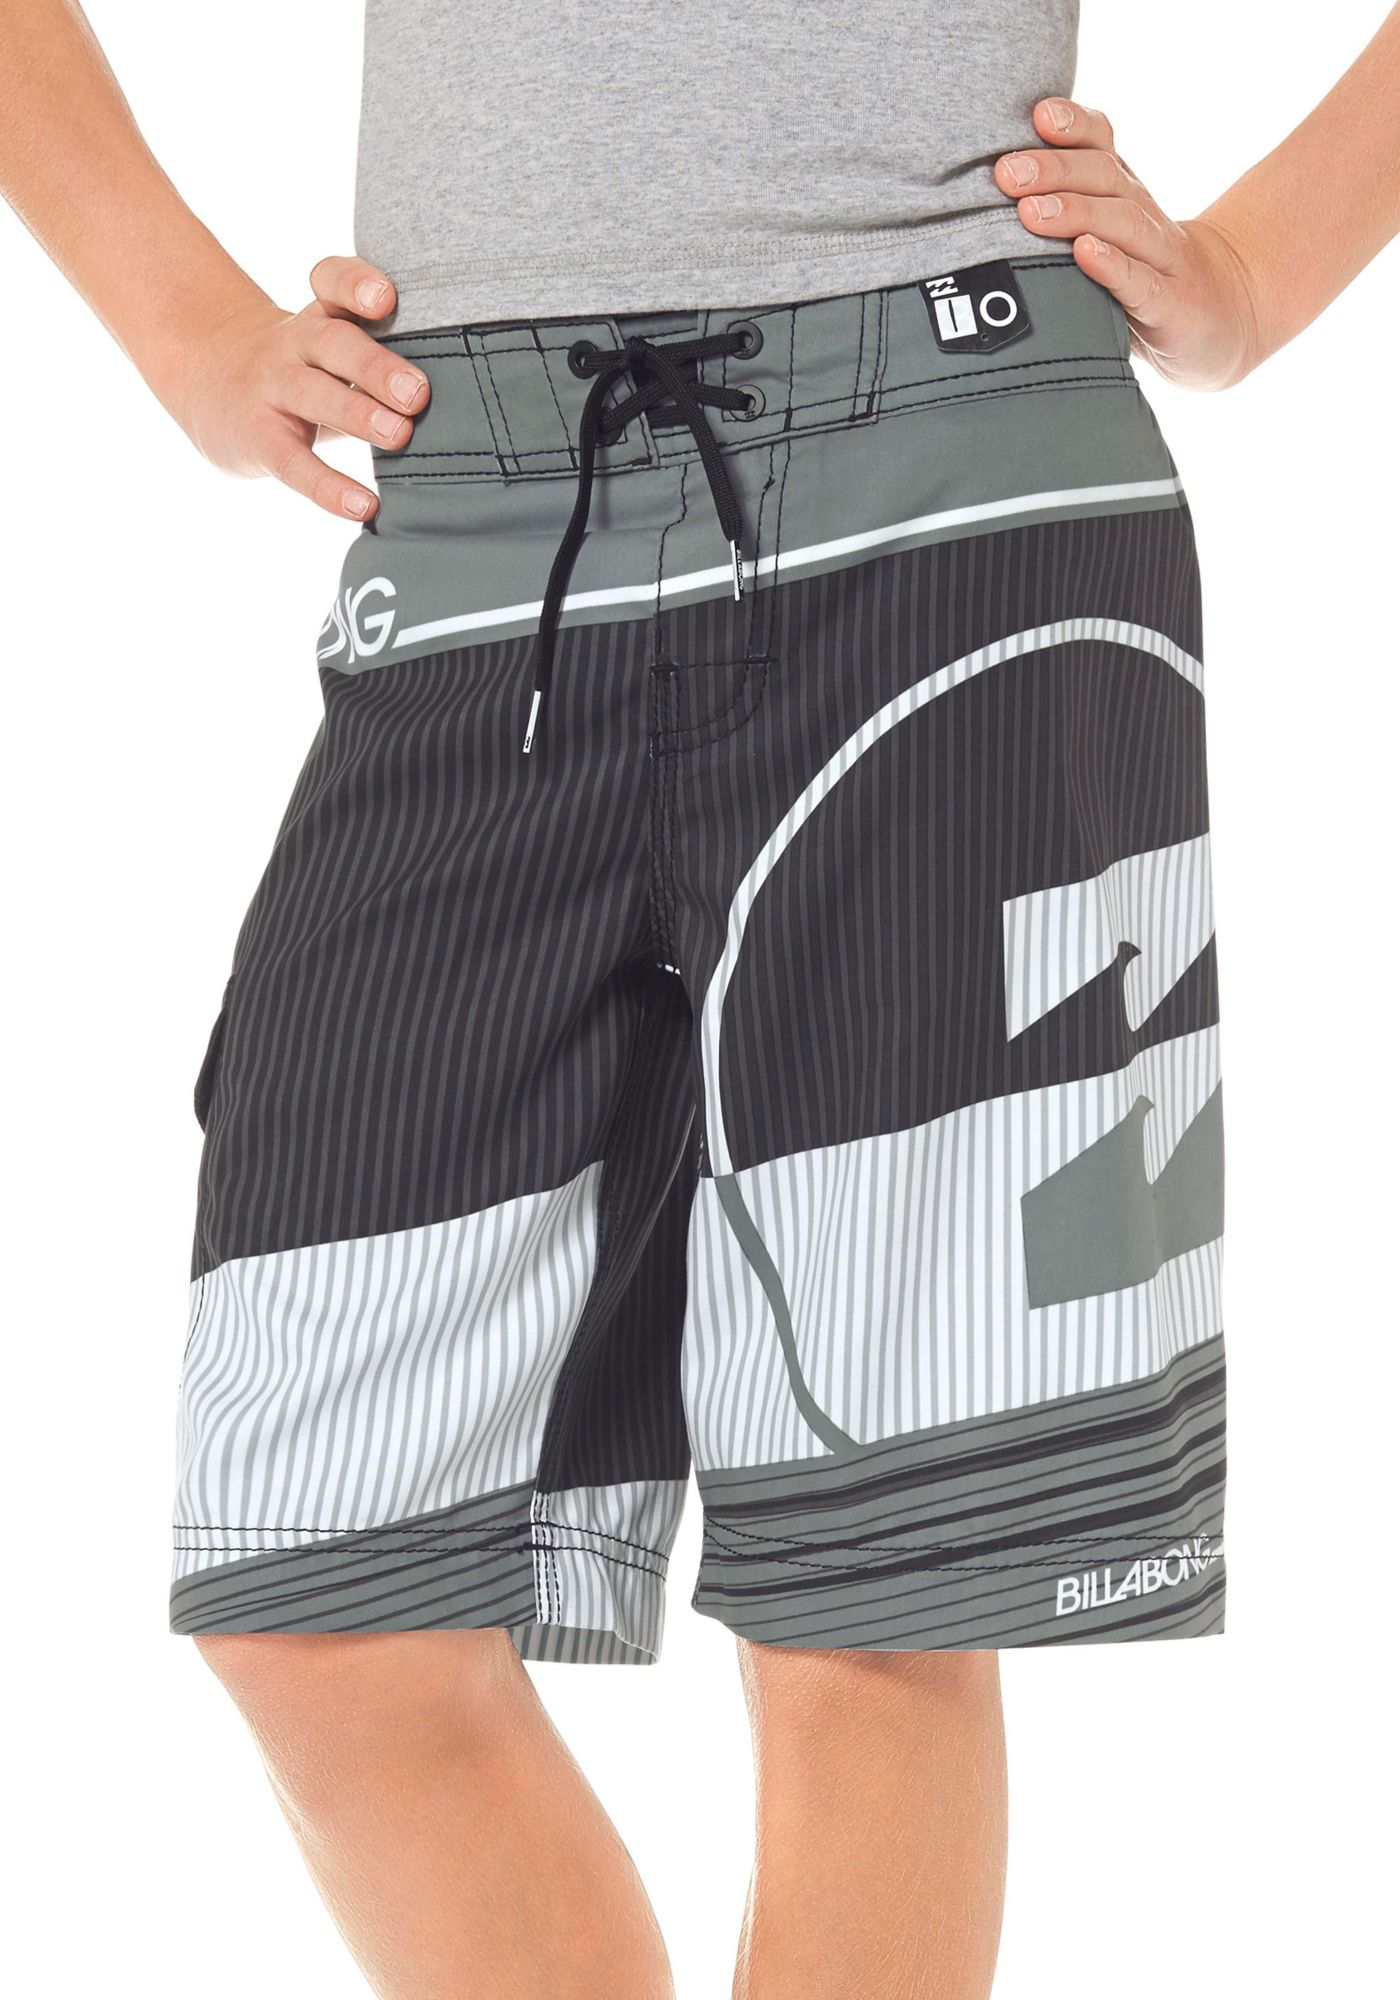 BILLABONG HERREN Billabong CHROMATIC BOYS Shorts